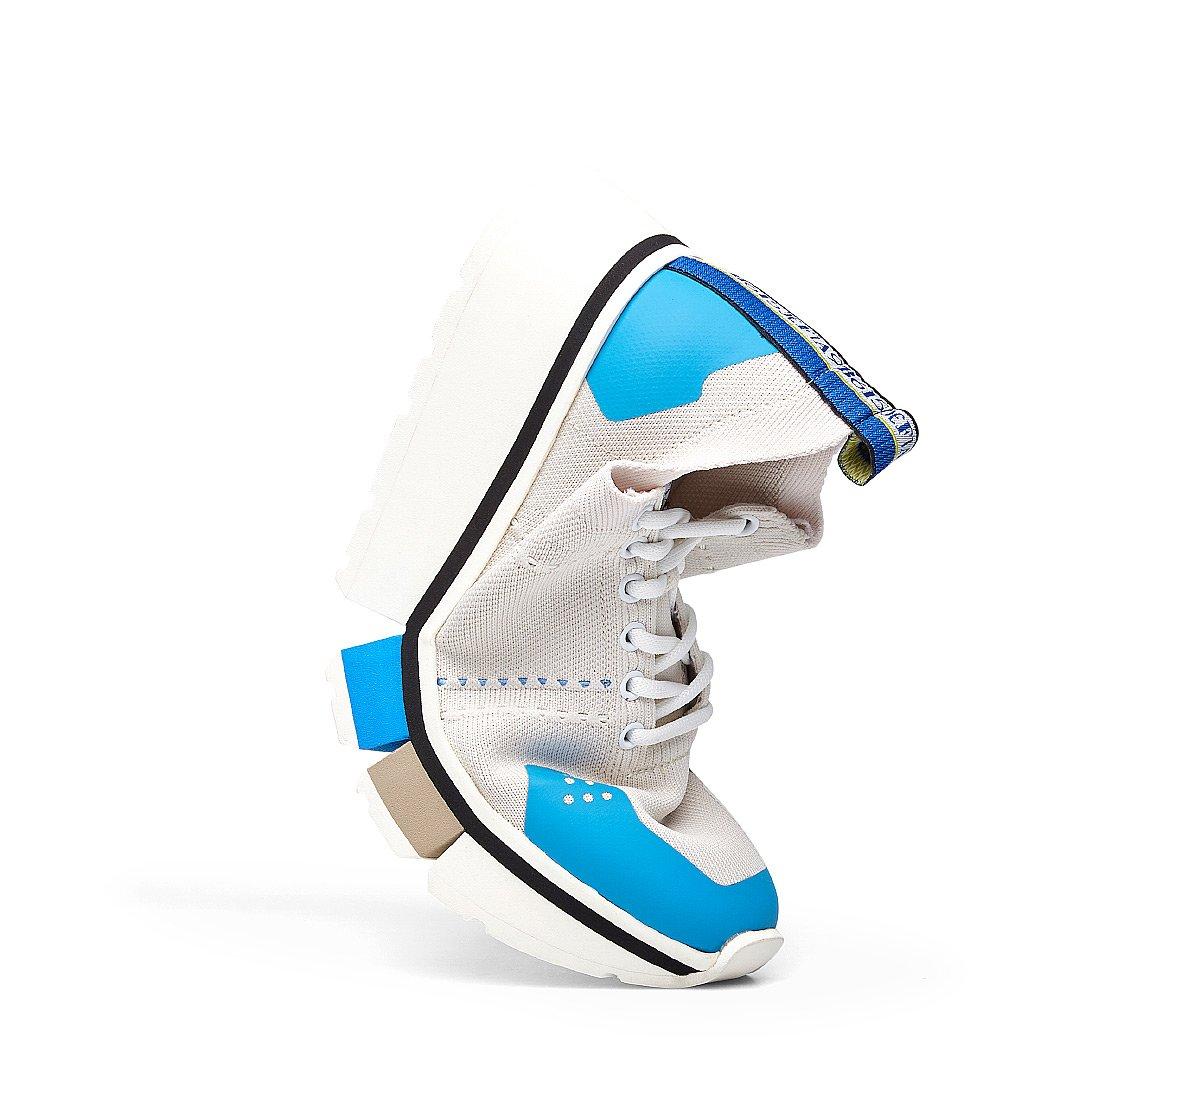 Fabi F65 sneaker